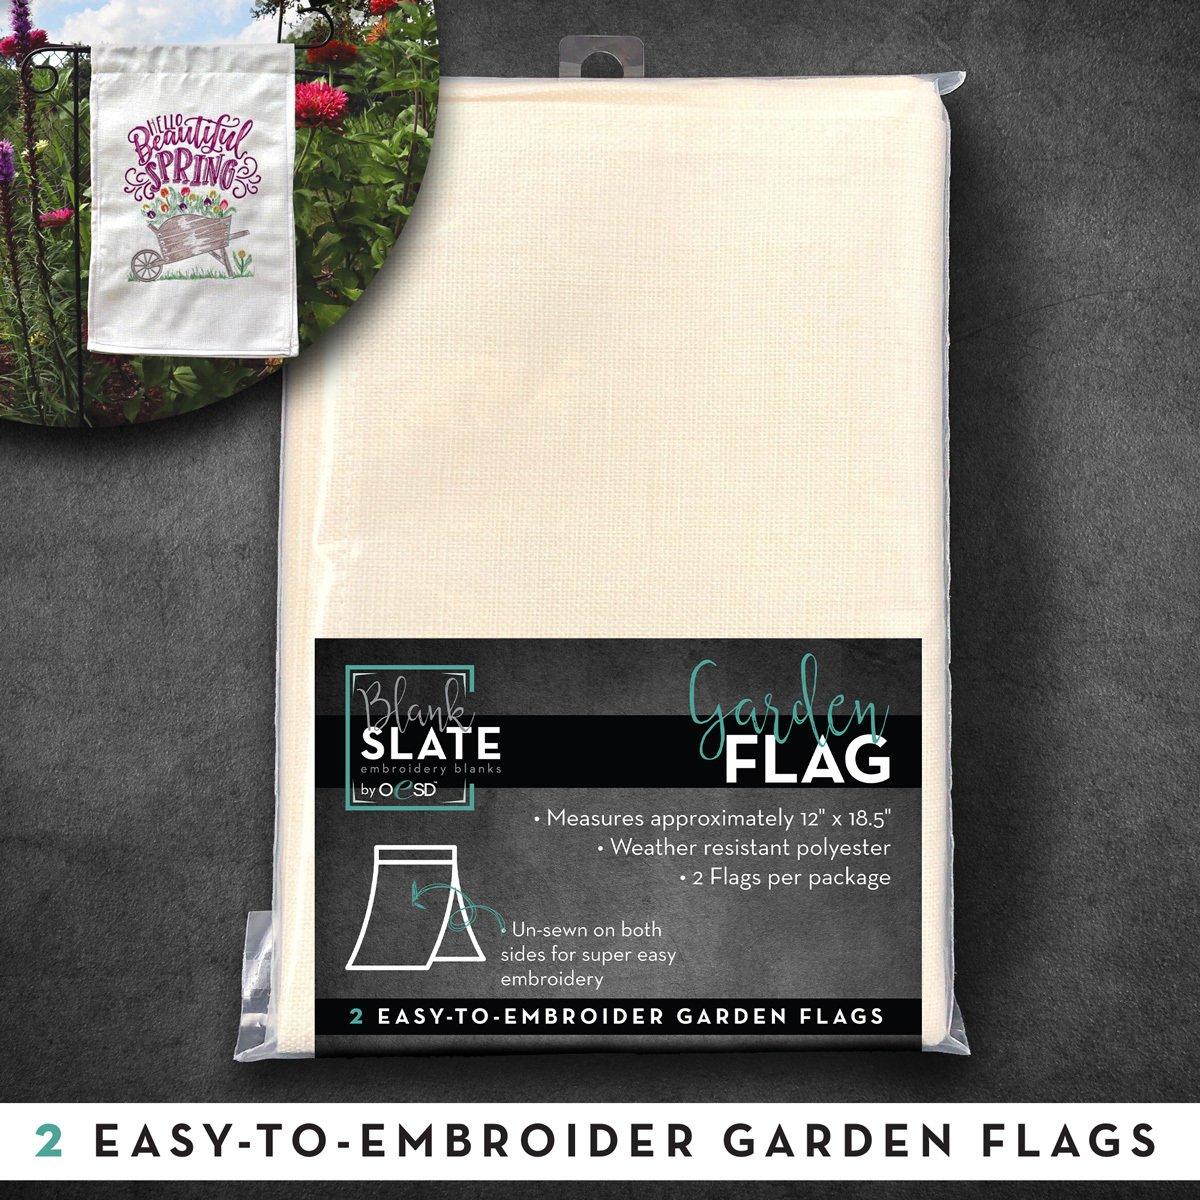 OESD Garden Flag 2 Pack